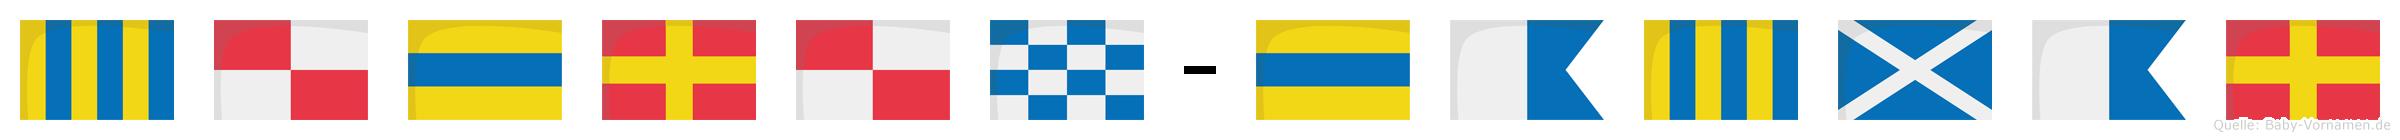 Gudrun-Dagmar im Flaggenalphabet